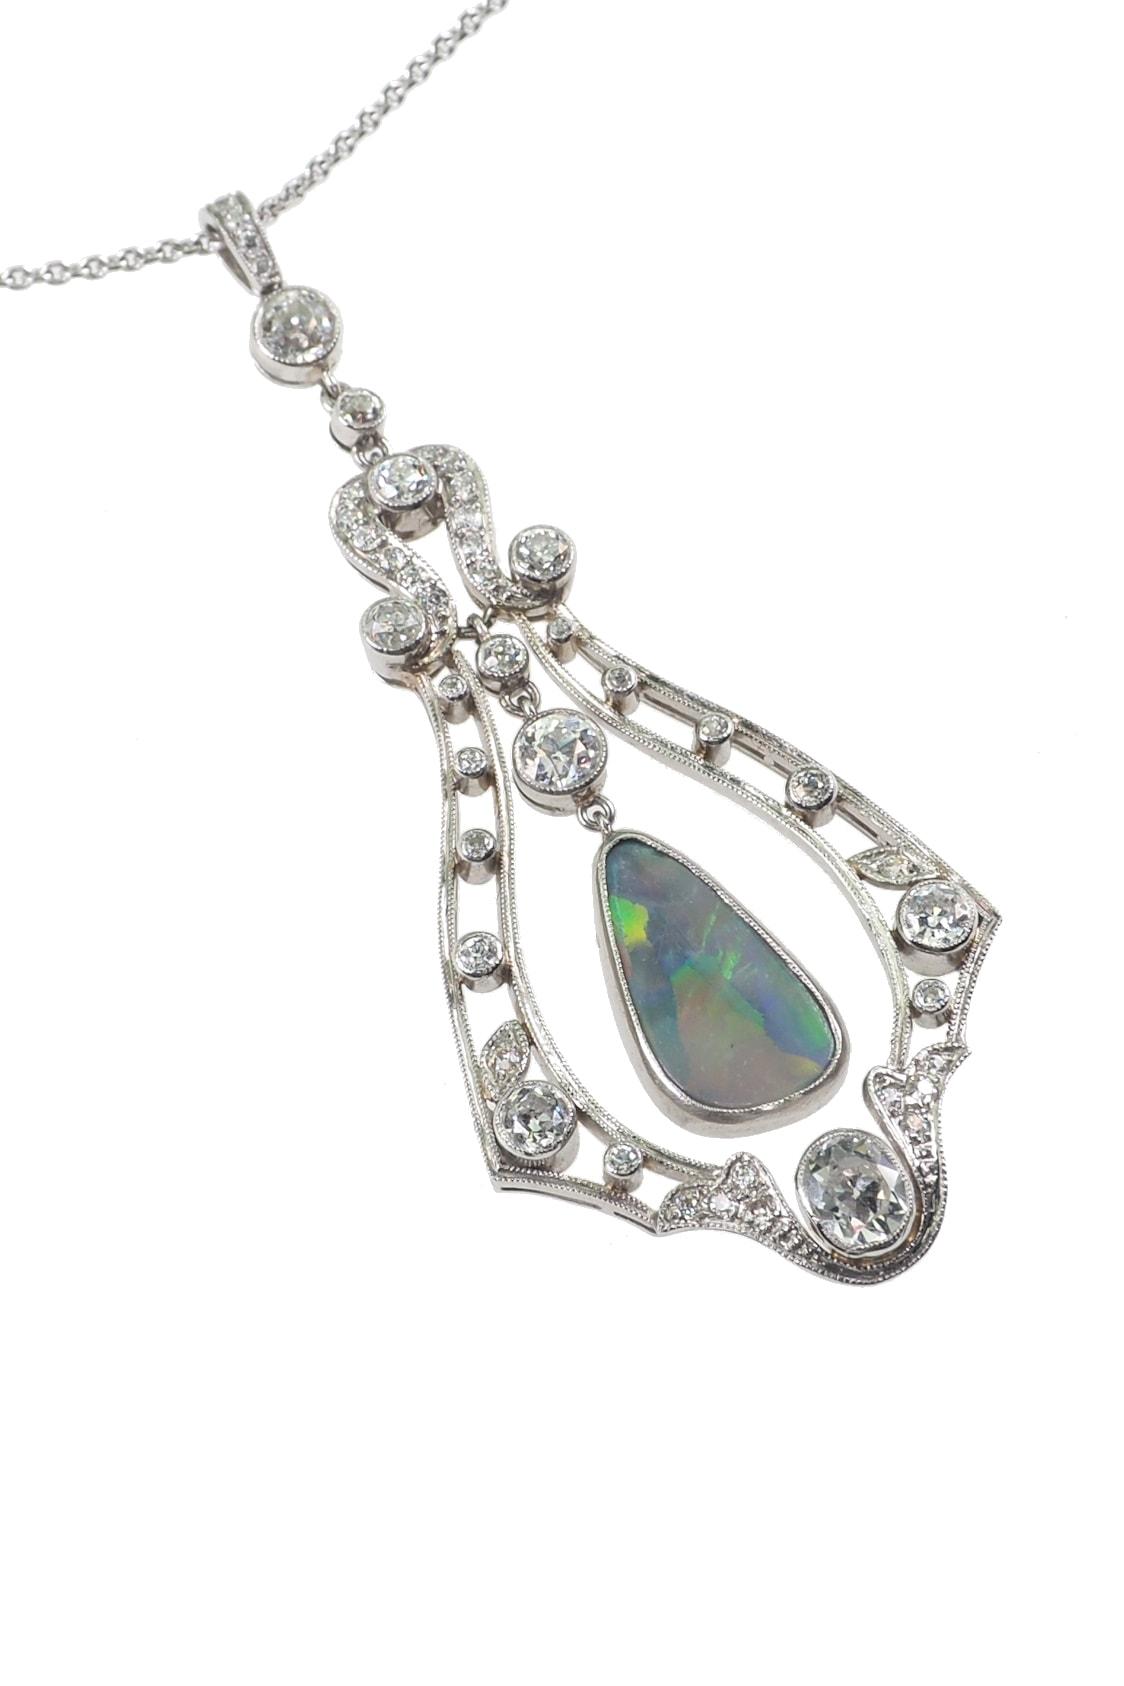 luxurious-antique-jewellery-2827b